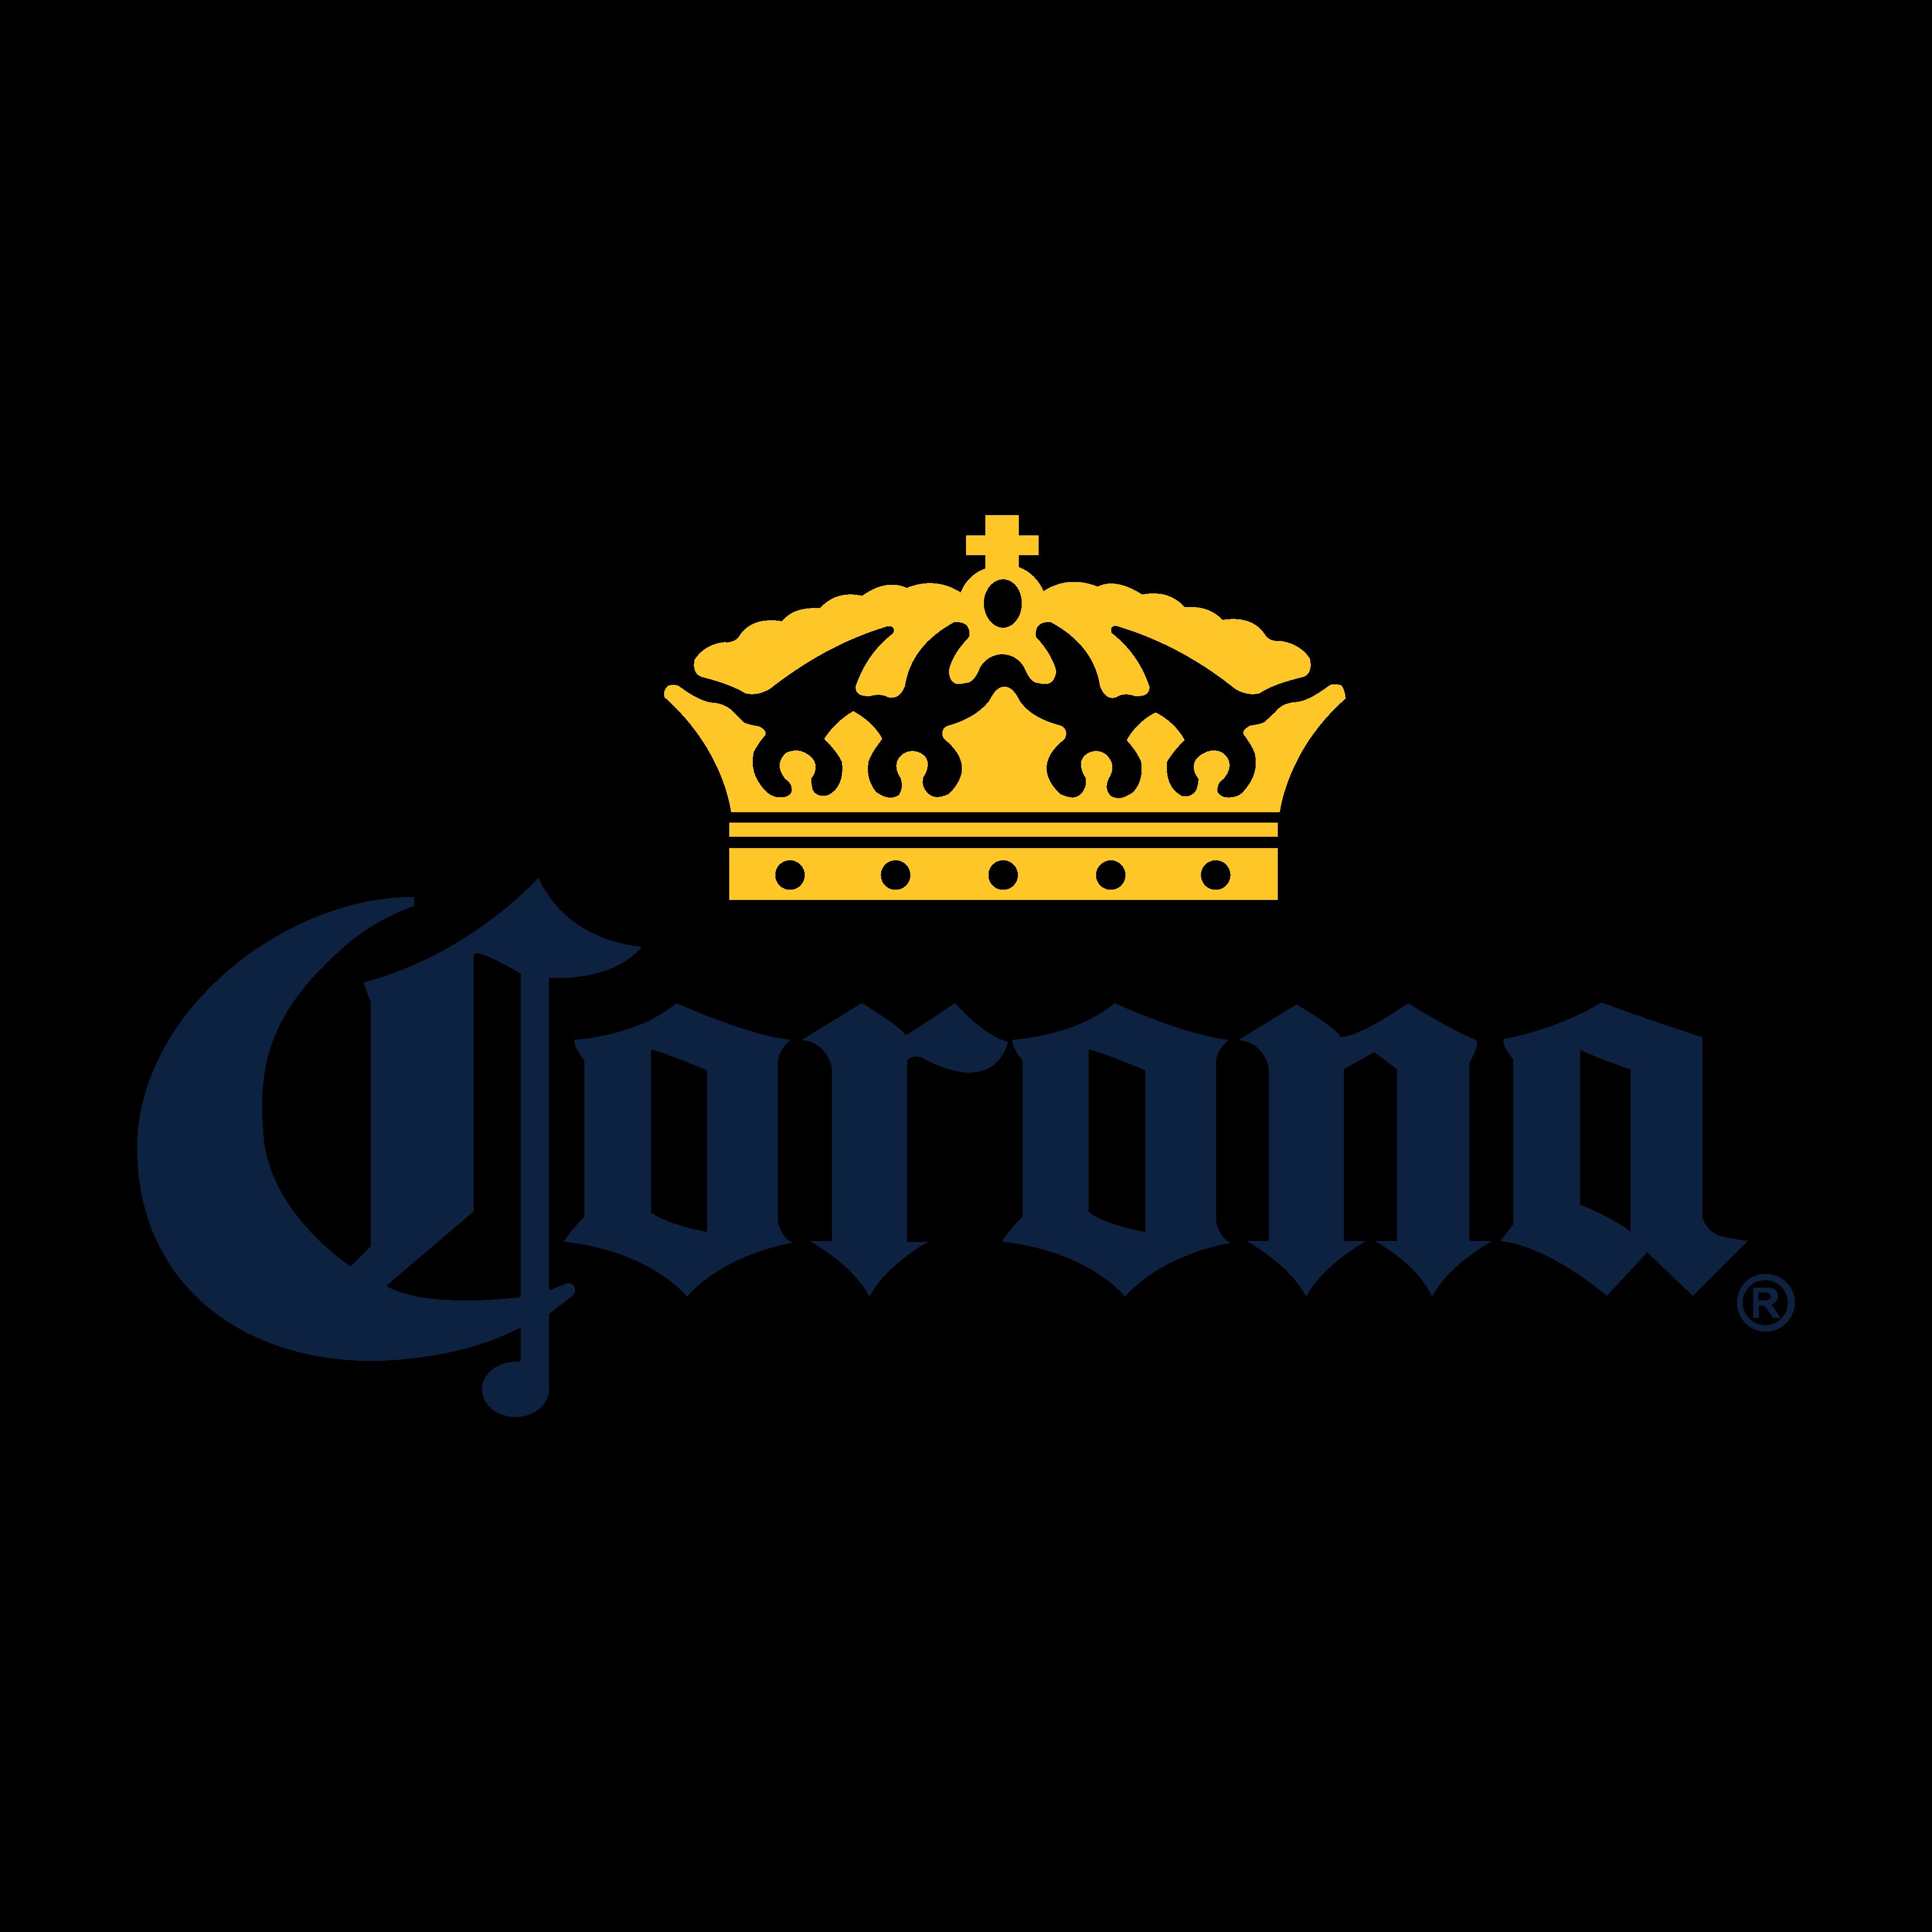 corona logo 0 - Corona Logo